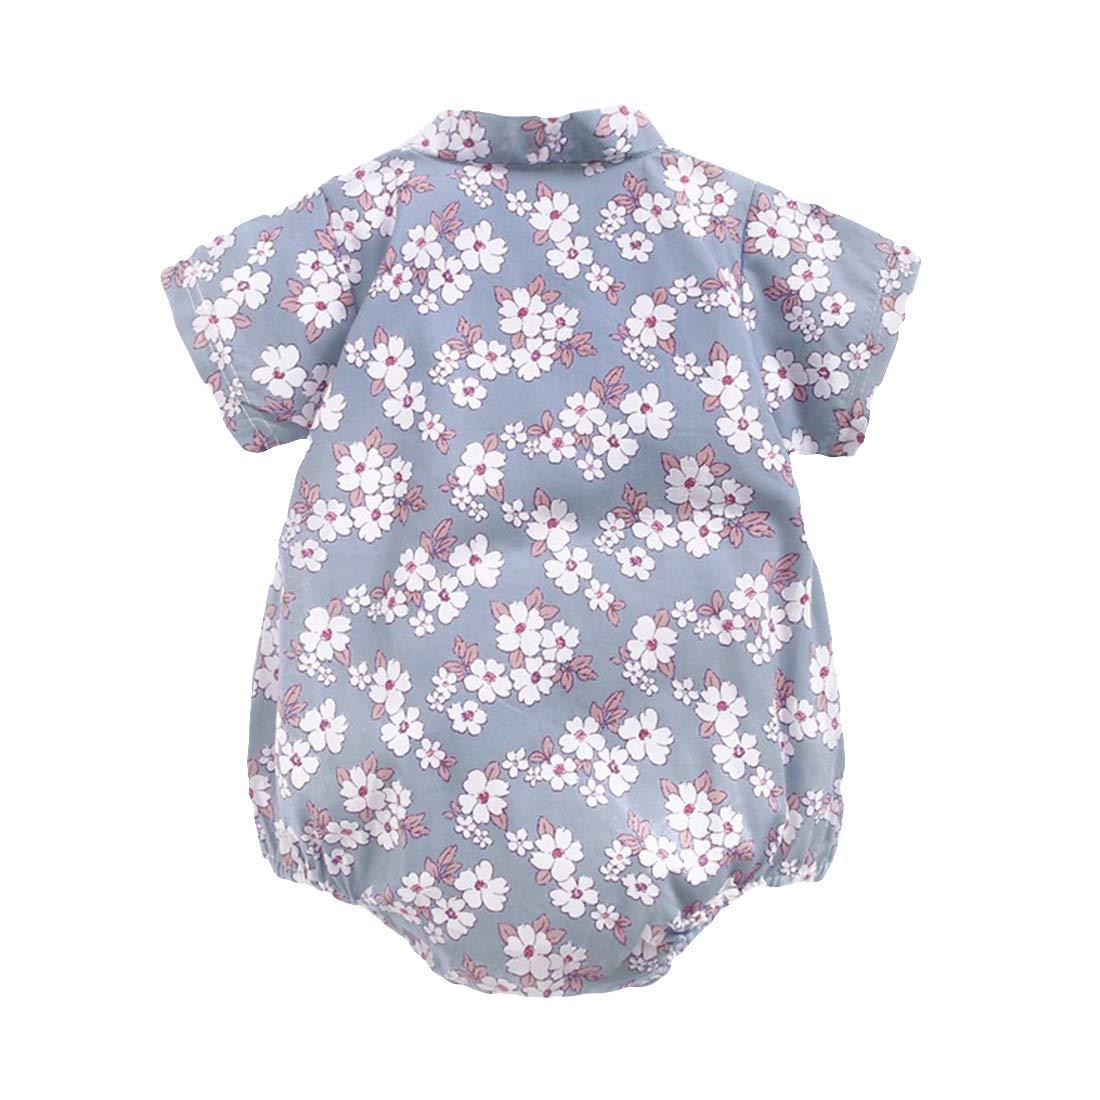 PAUBOLI Baby Kimono Romper Japanese Sakura Cotton Infant Comfy Pajamas 3-24 Months